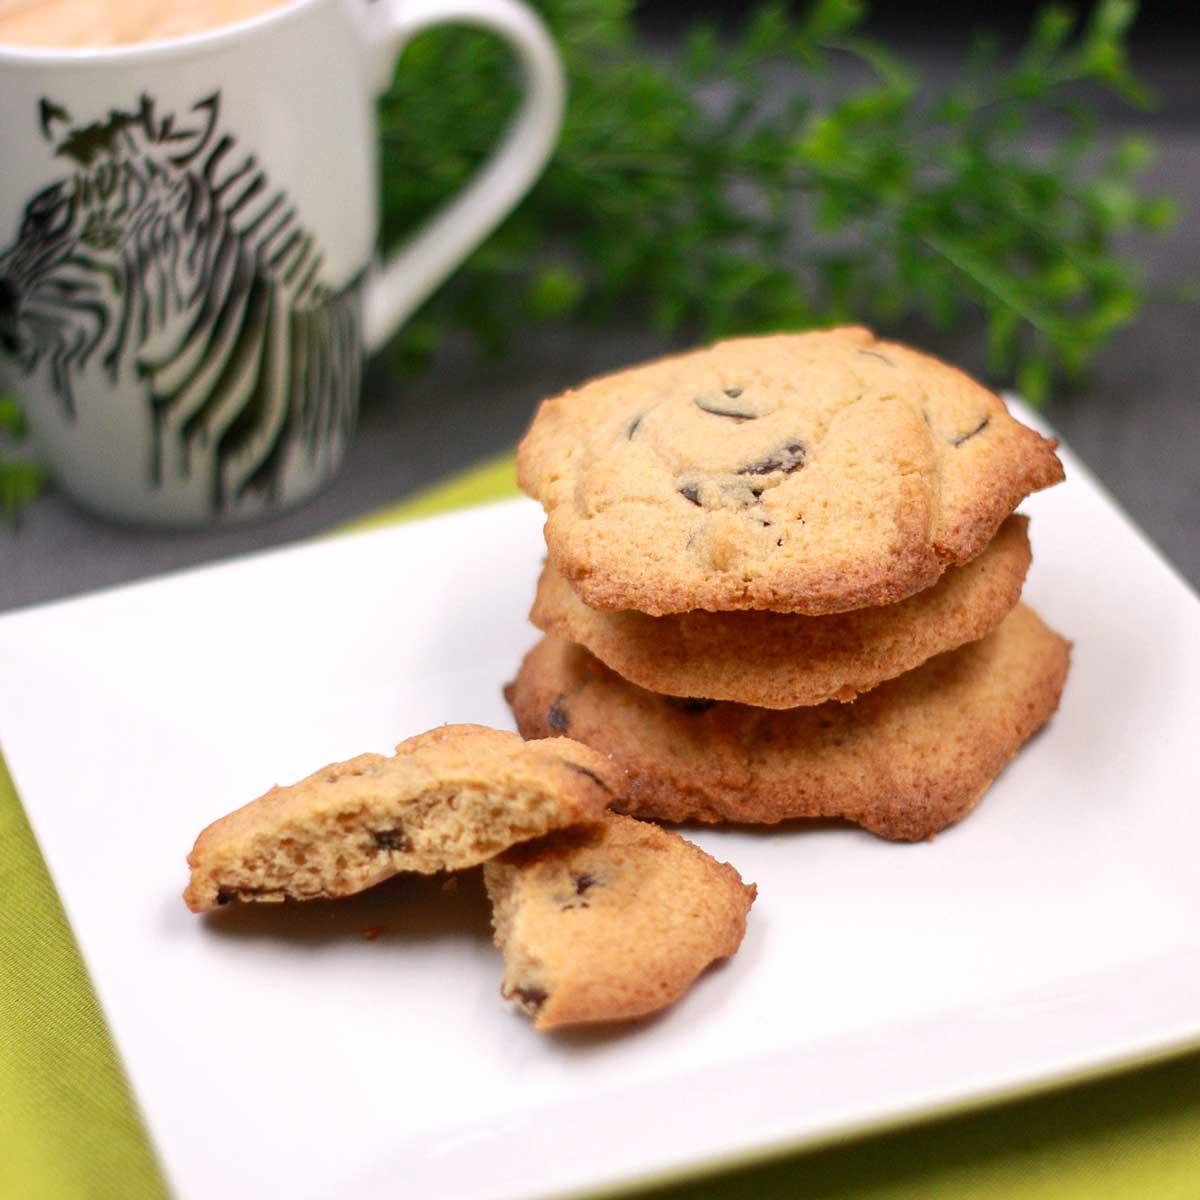 Die Chocolate-Chip-Cookies sind lecker und Low Carb.